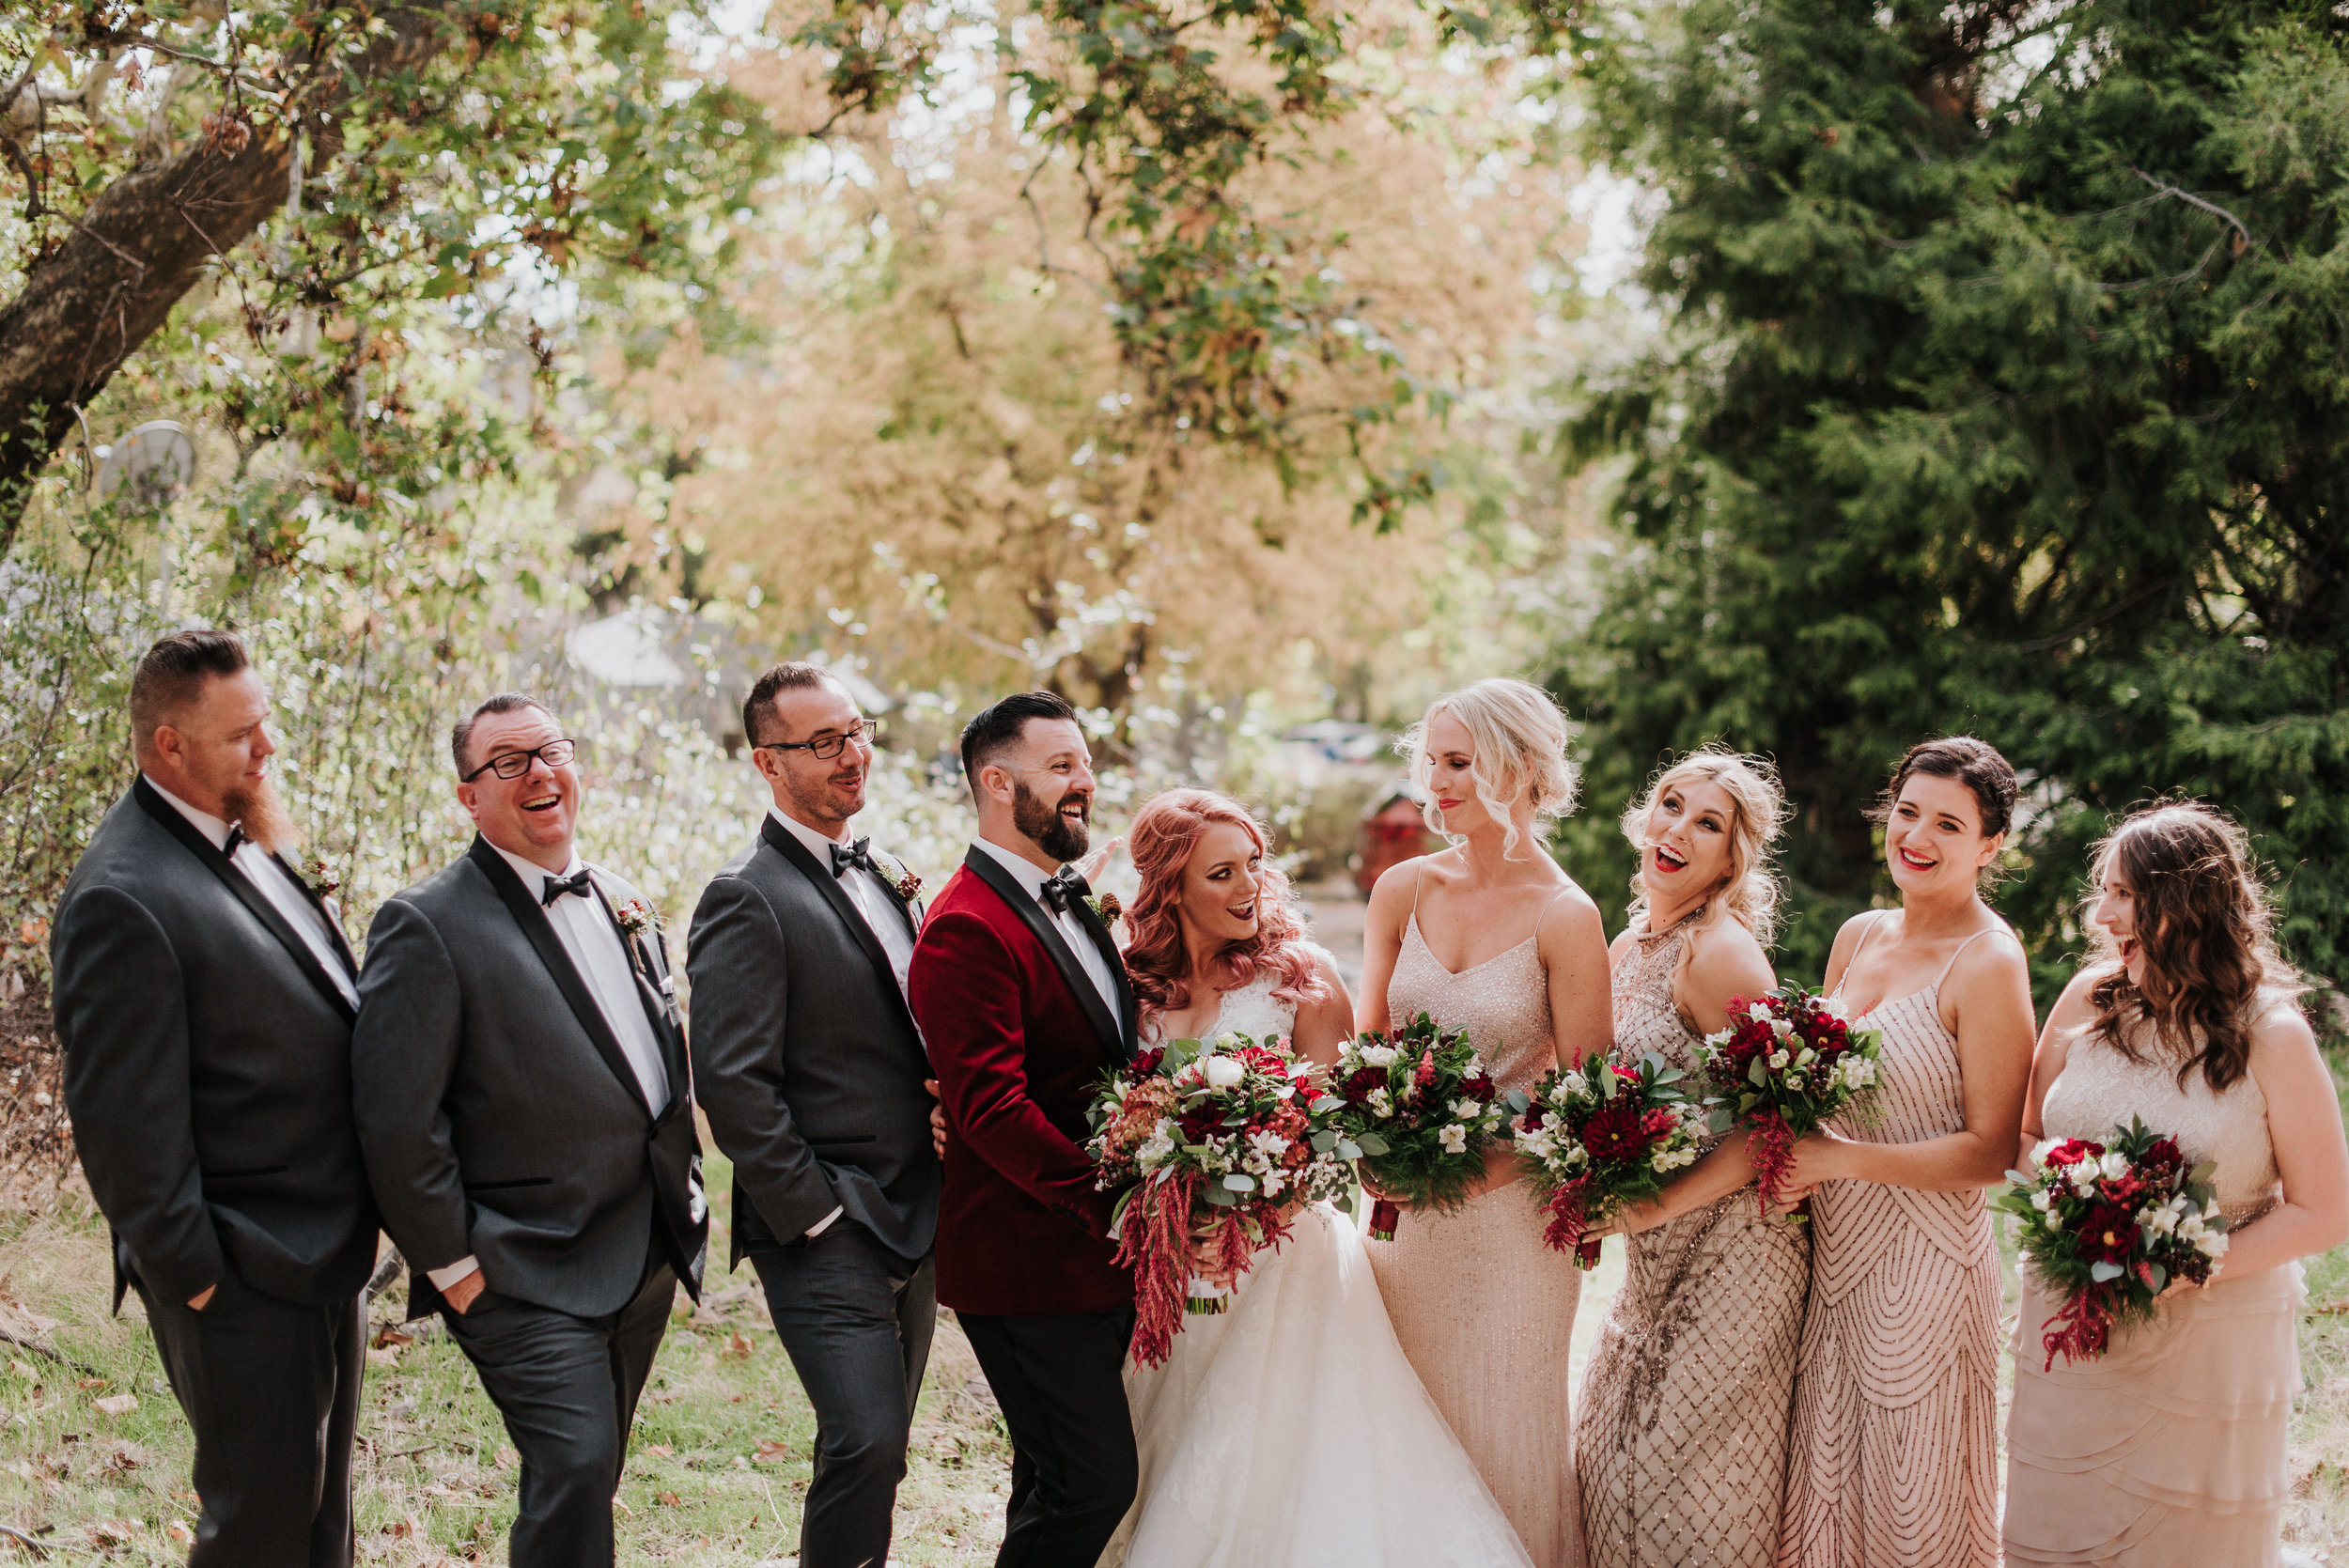 2018-11-04 Maresa and Nick - Married - Oak Glen-291.jpg